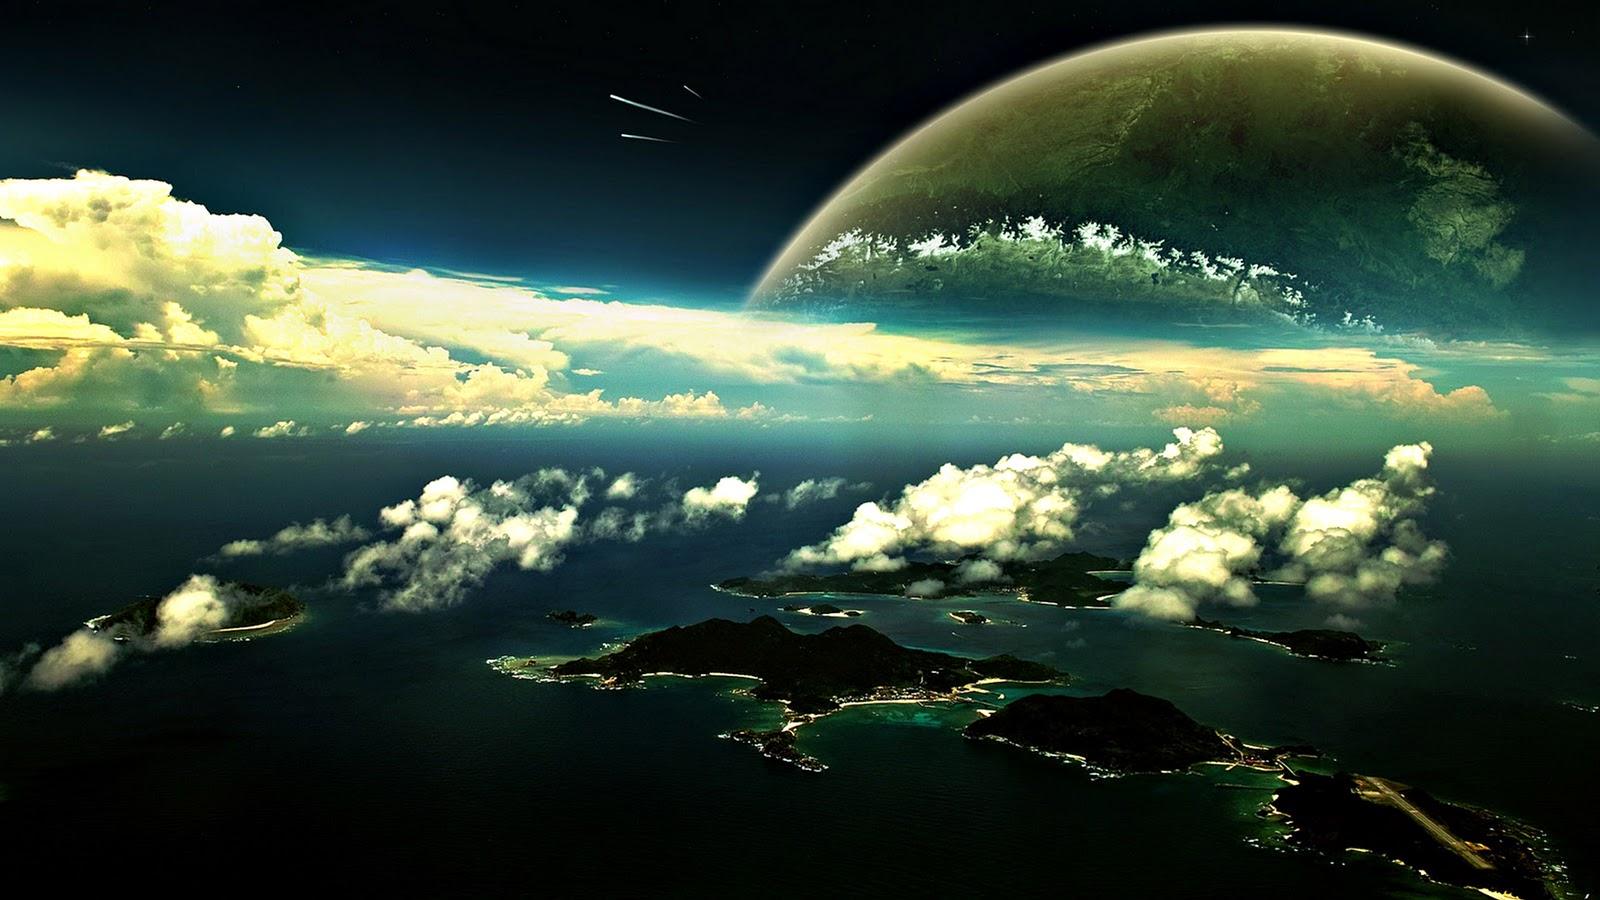 http://4.bp.blogspot.com/-N_N_b56N7sw/TyVnfDUS_QI/AAAAAAAAATo/maitgNZfJI0/s1600/Wonderfull+worlds+creature+wallpaper.jpg